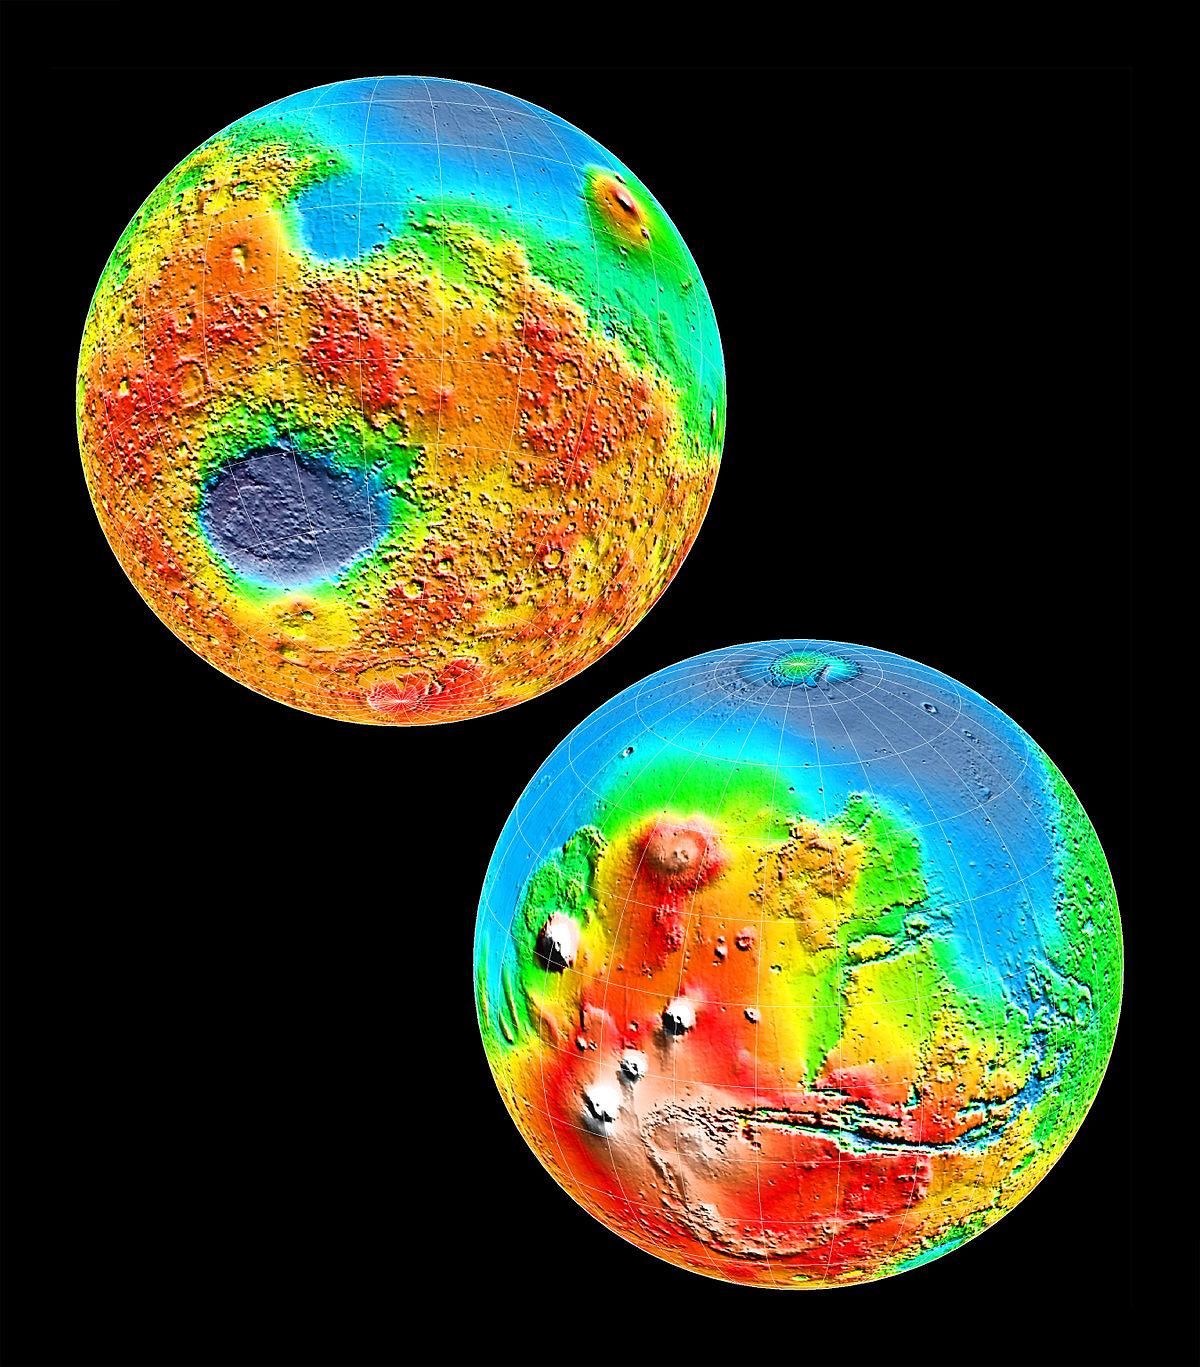 Mars Orbiter Laser Altimeter